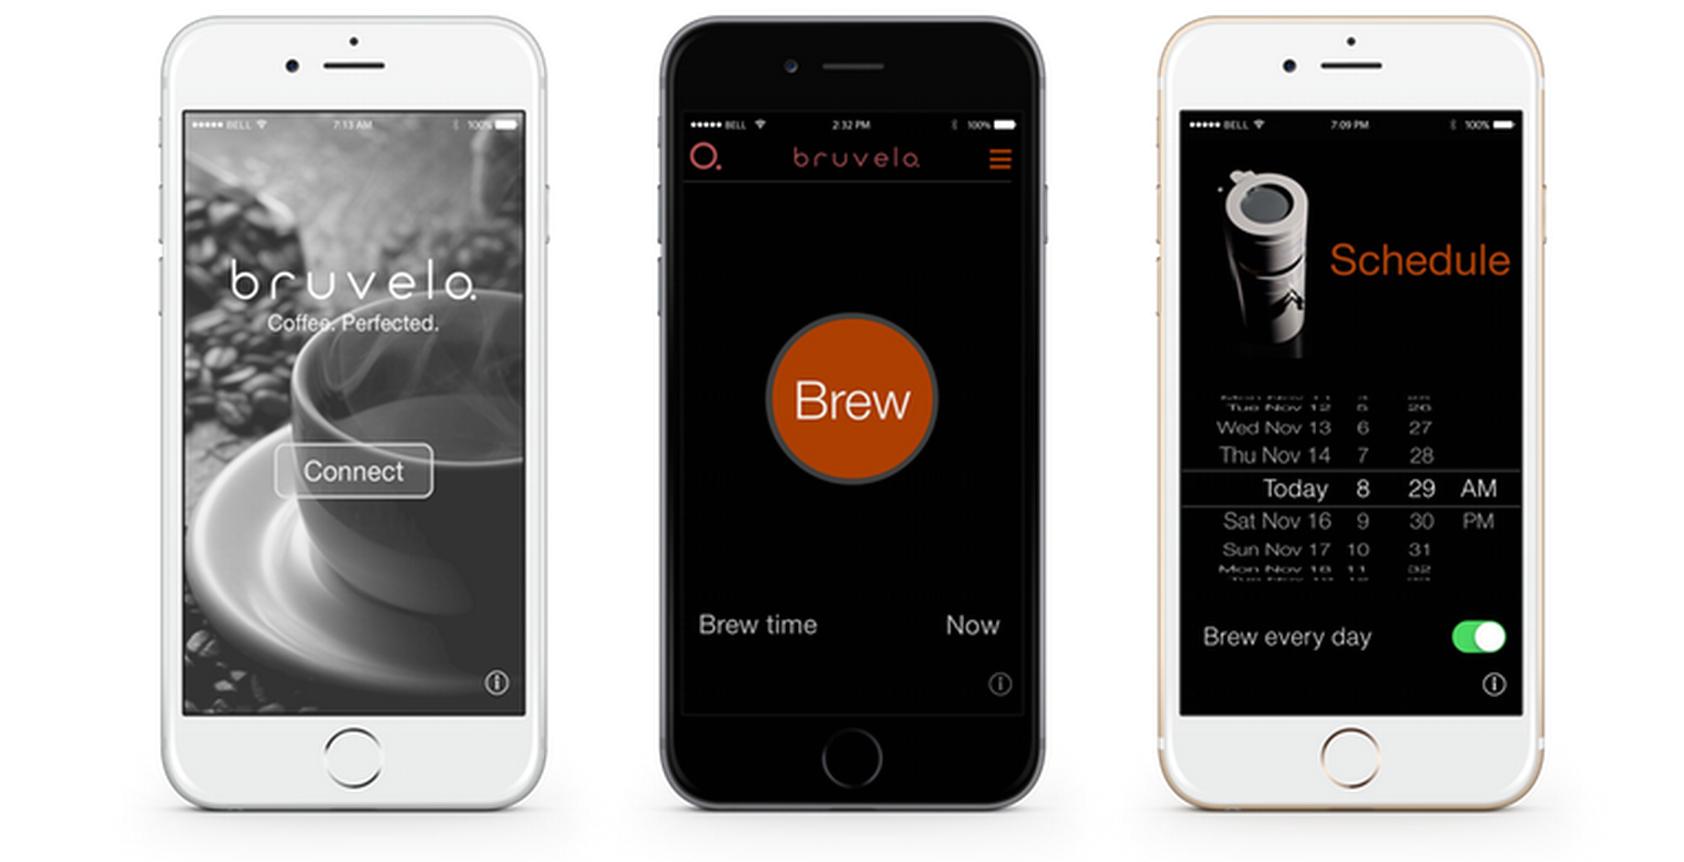 bruvelo-ios-kickstarter